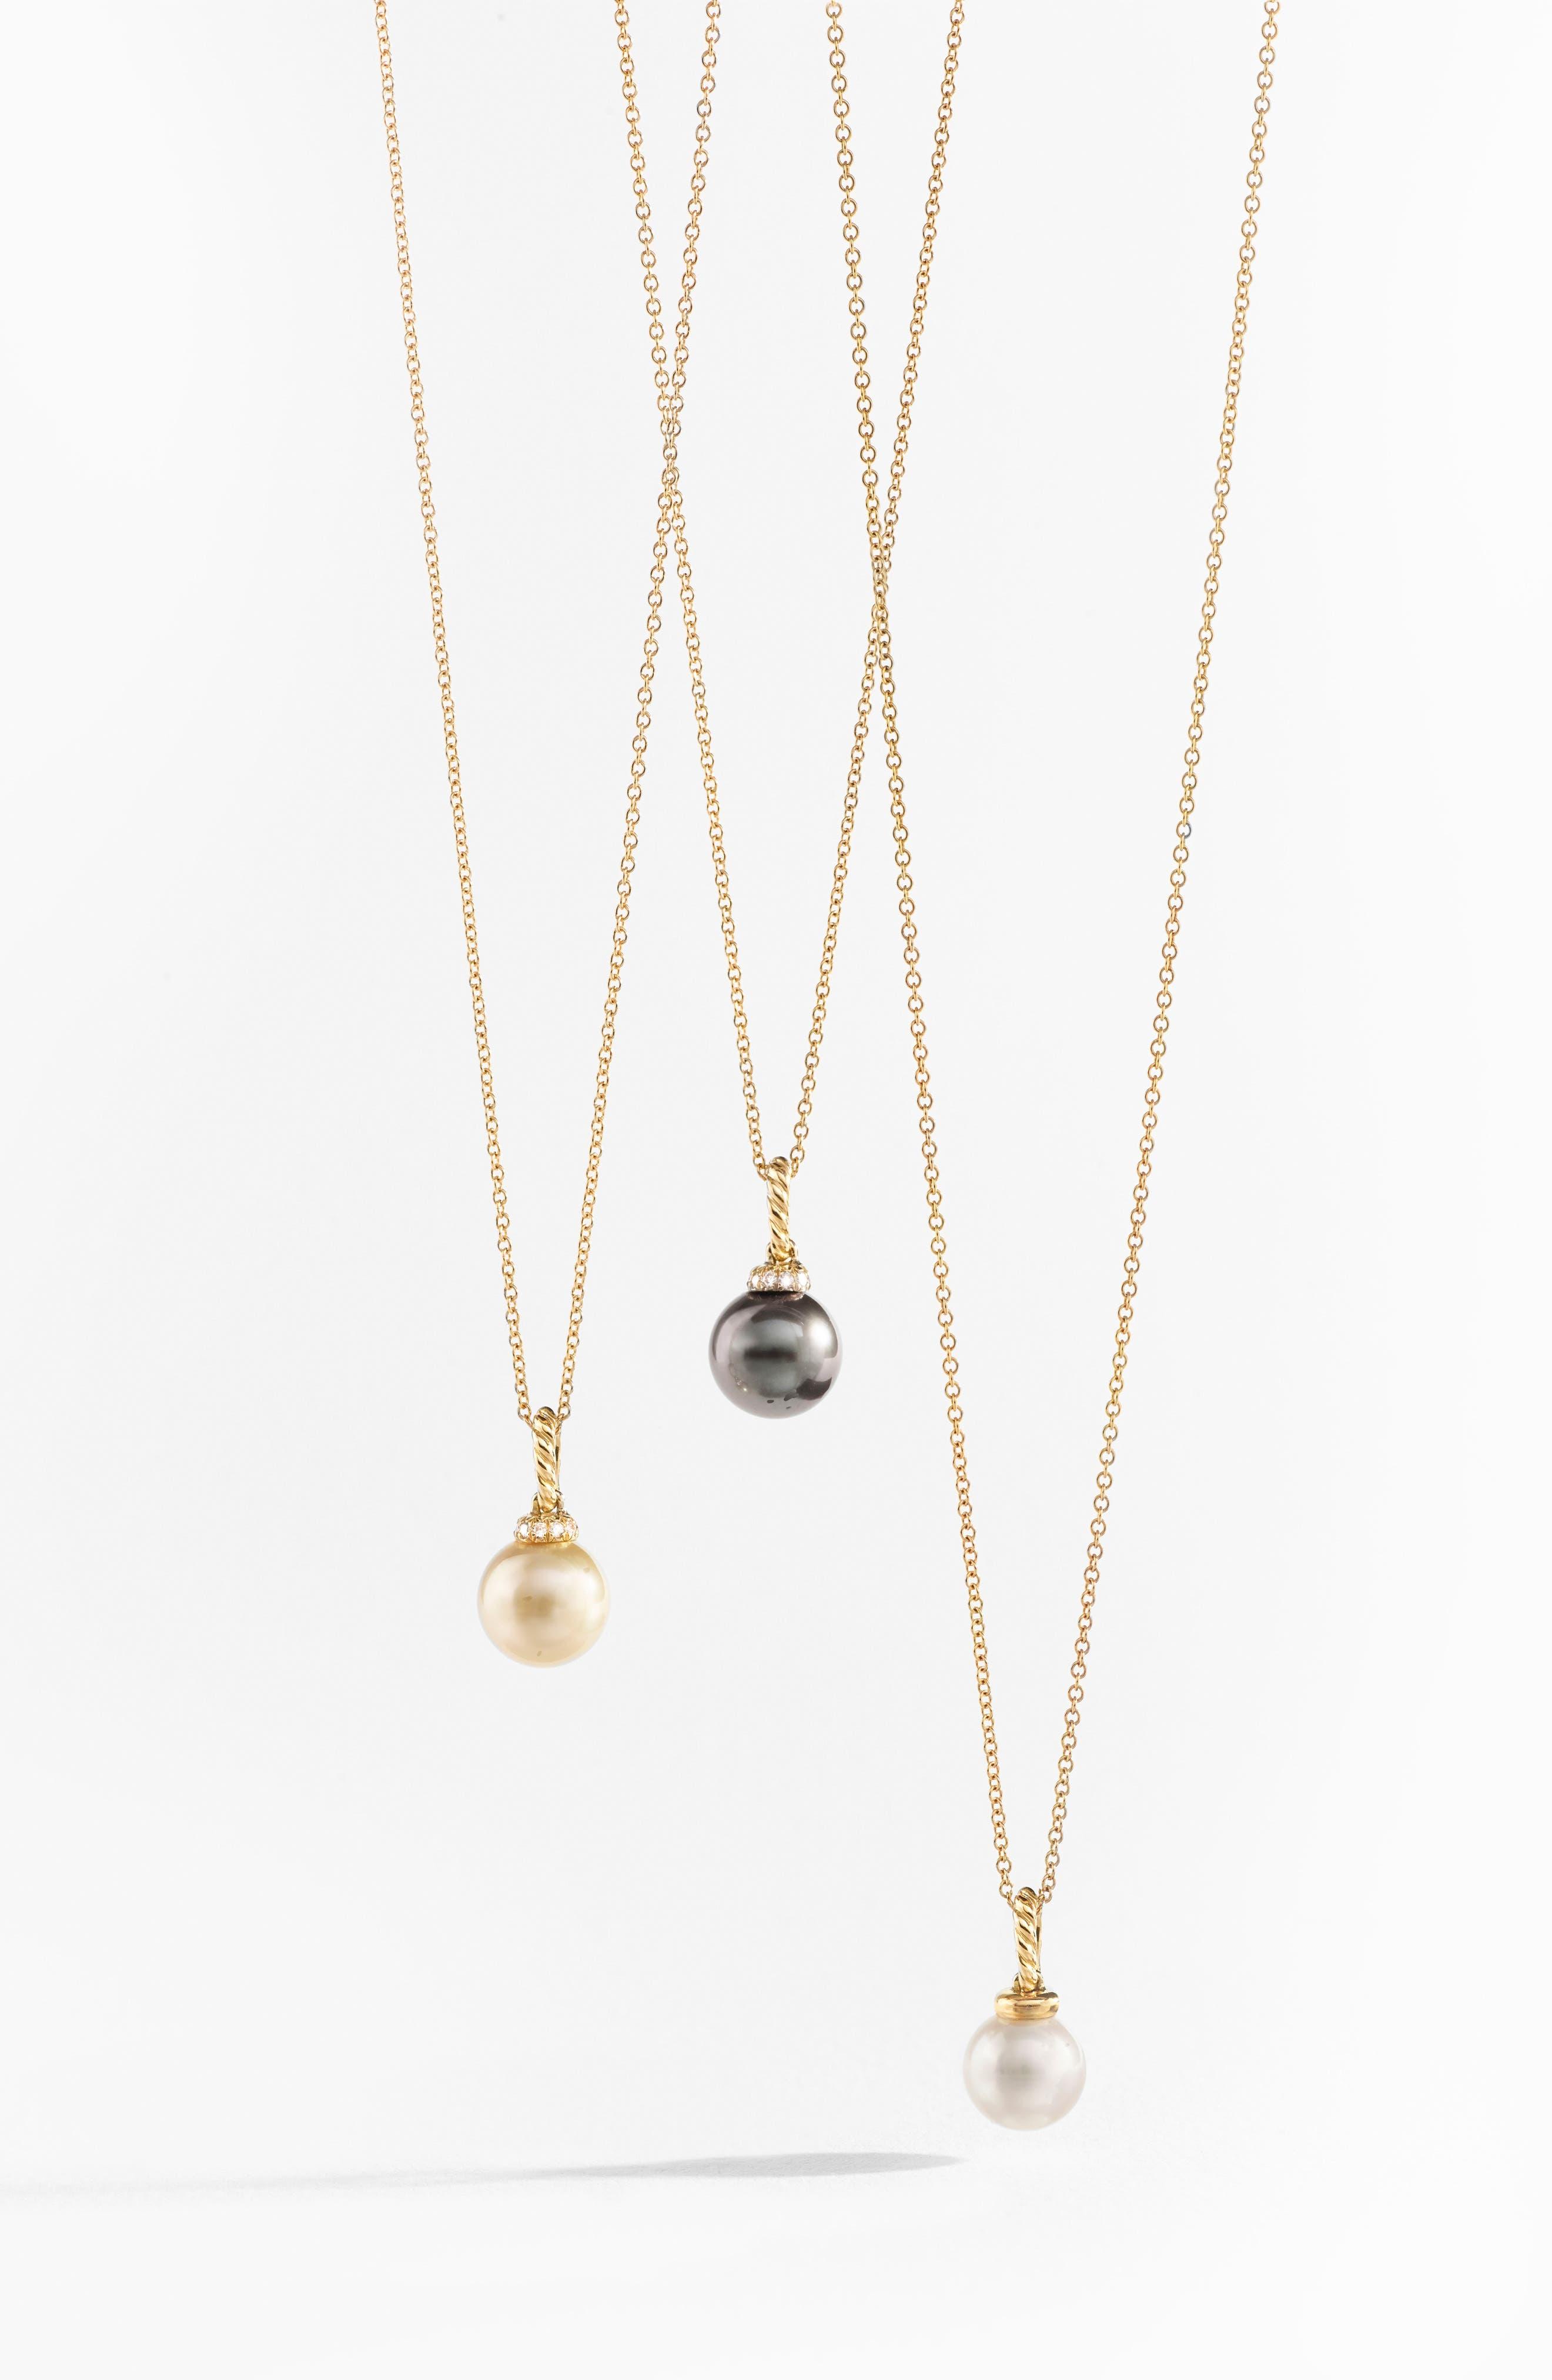 Solari Pendant Necklace with Diamonds,                             Alternate thumbnail 4, color,                             GOLD/ DIAMOND/ GREY PEARL